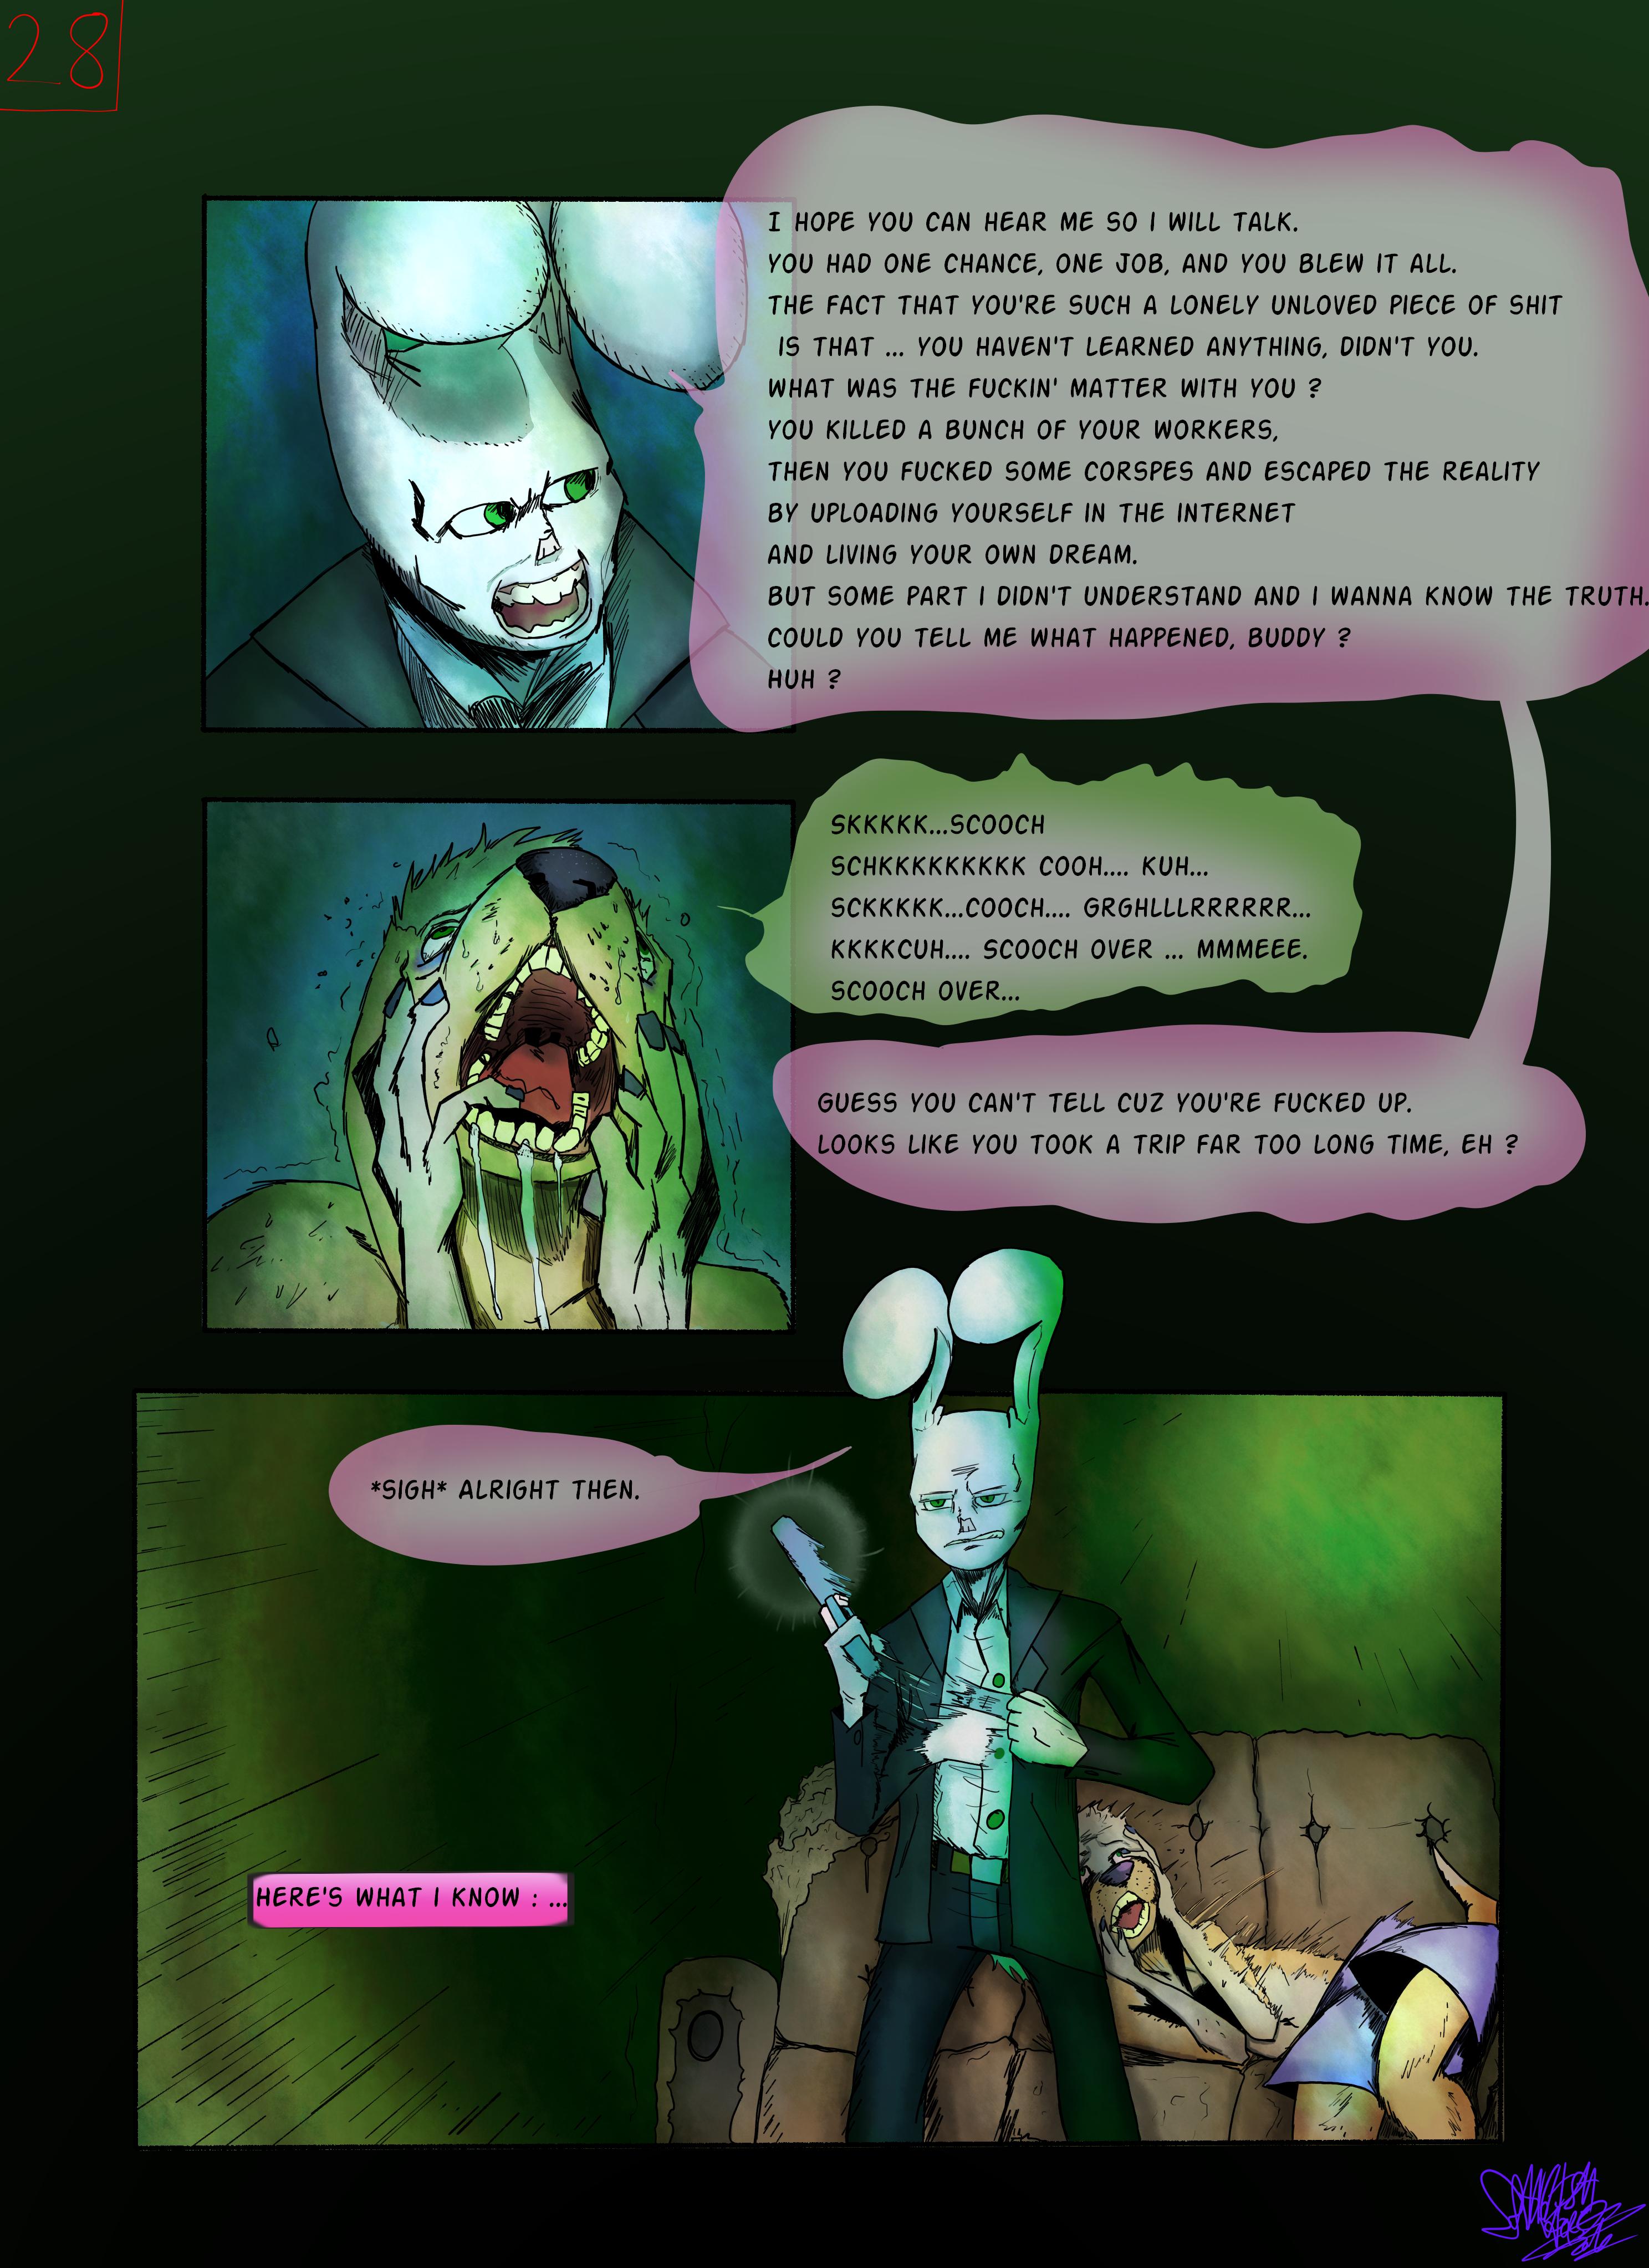 Bob the Psycho Rabbit Vs Alfred Alfer Page 28 (comic) (28/39)